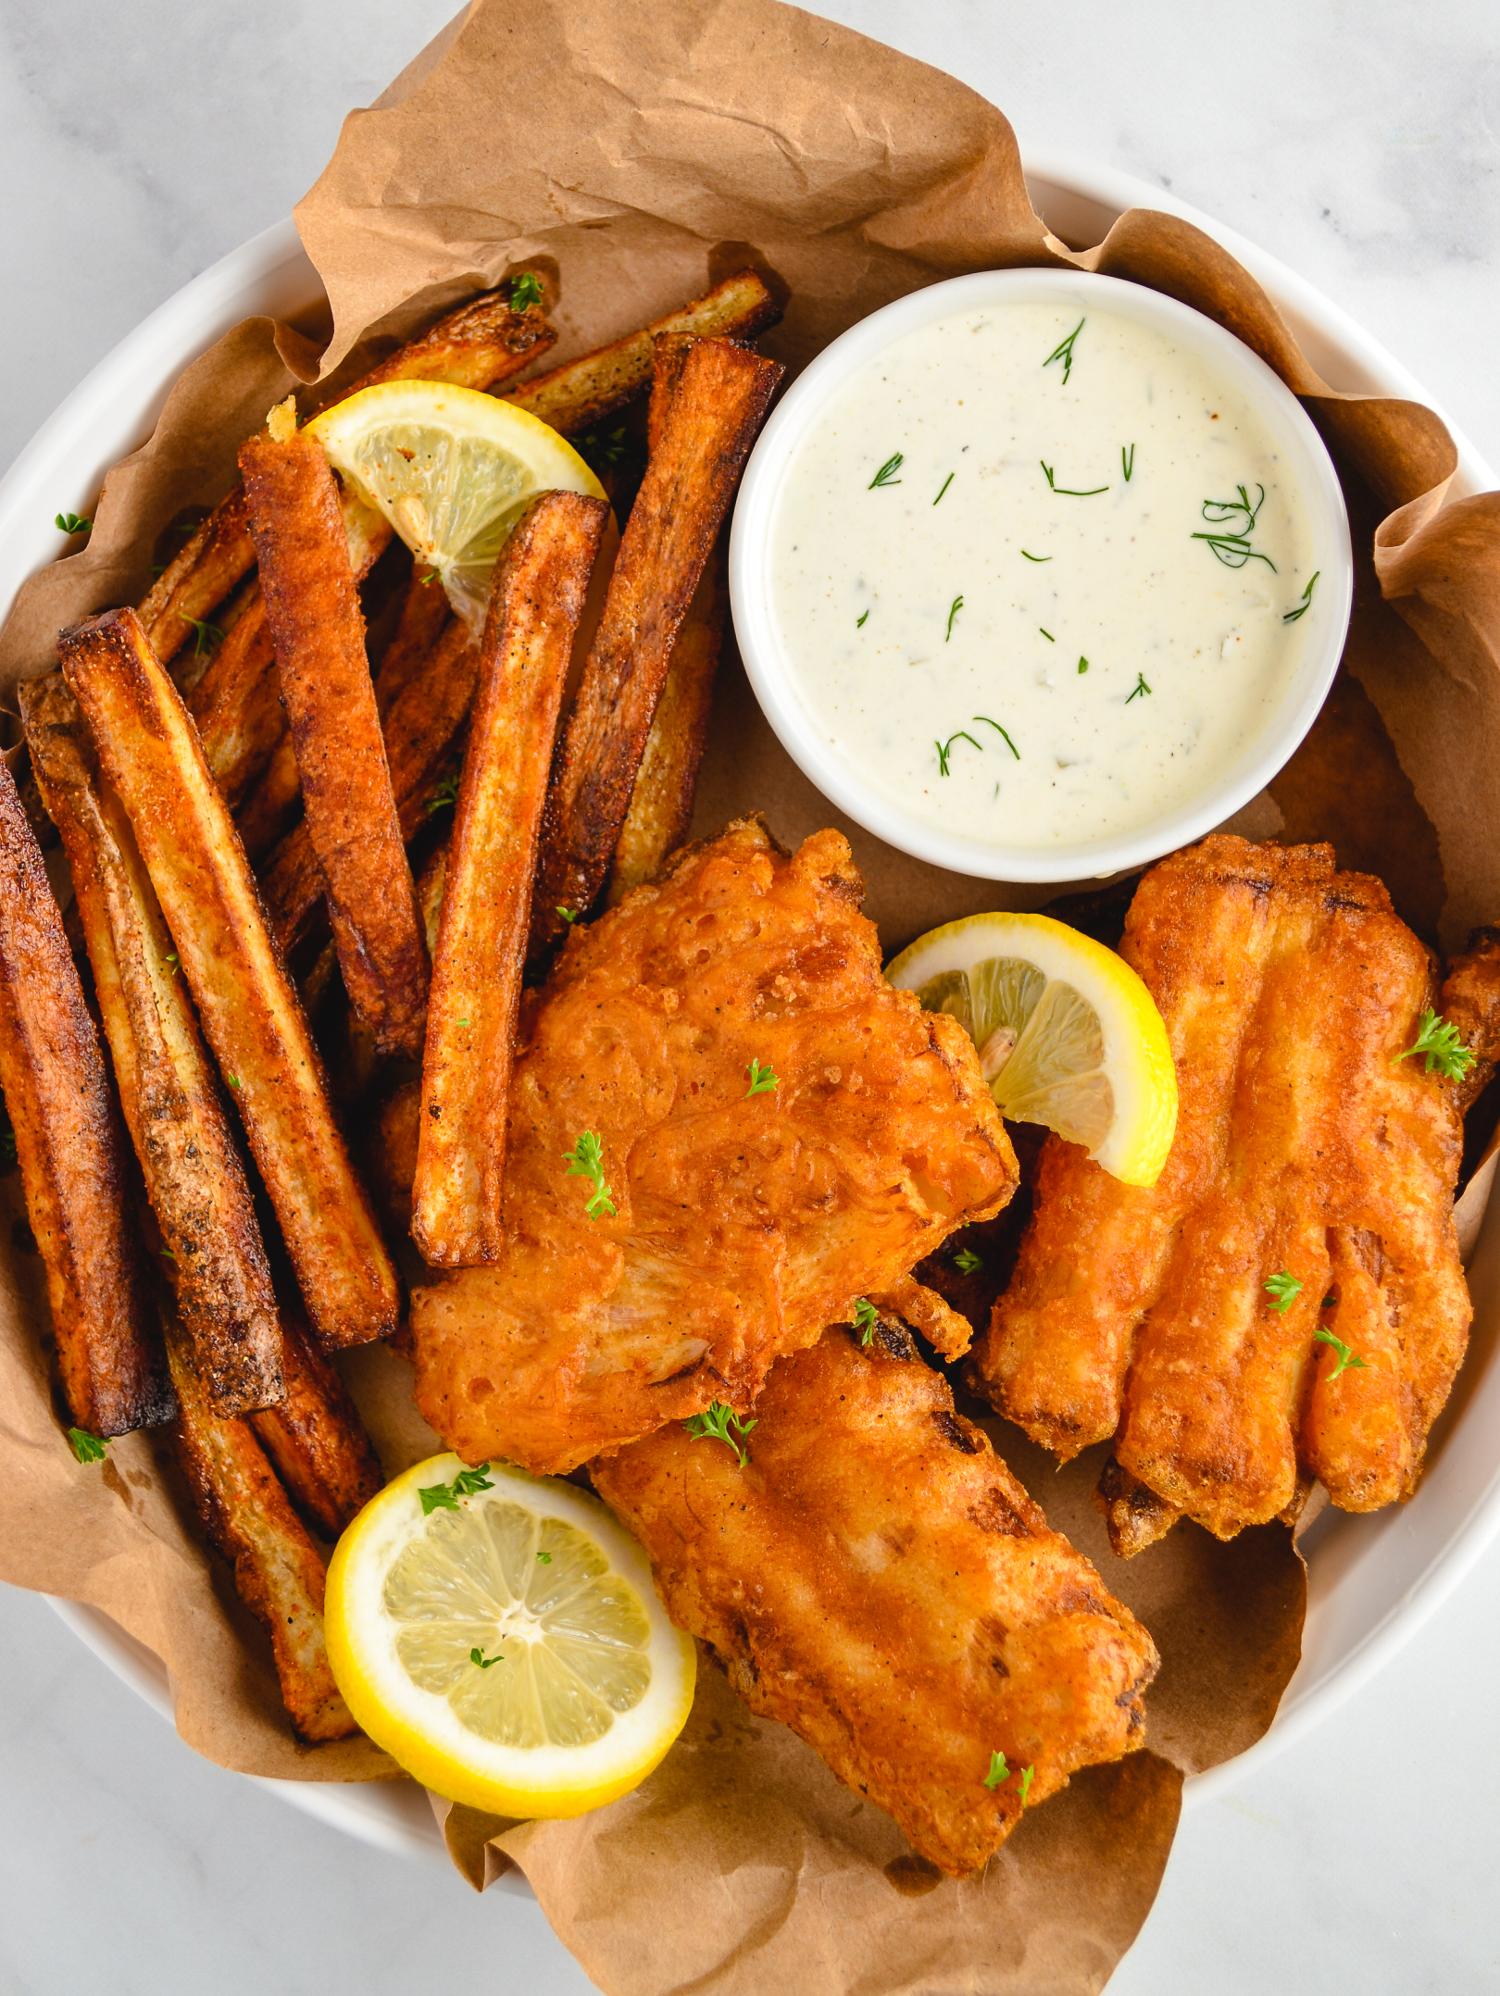 Vegan Fish And Chips Recipe With Images Vegan Fish And Chips Vegan Fish Vegan Meal Plans